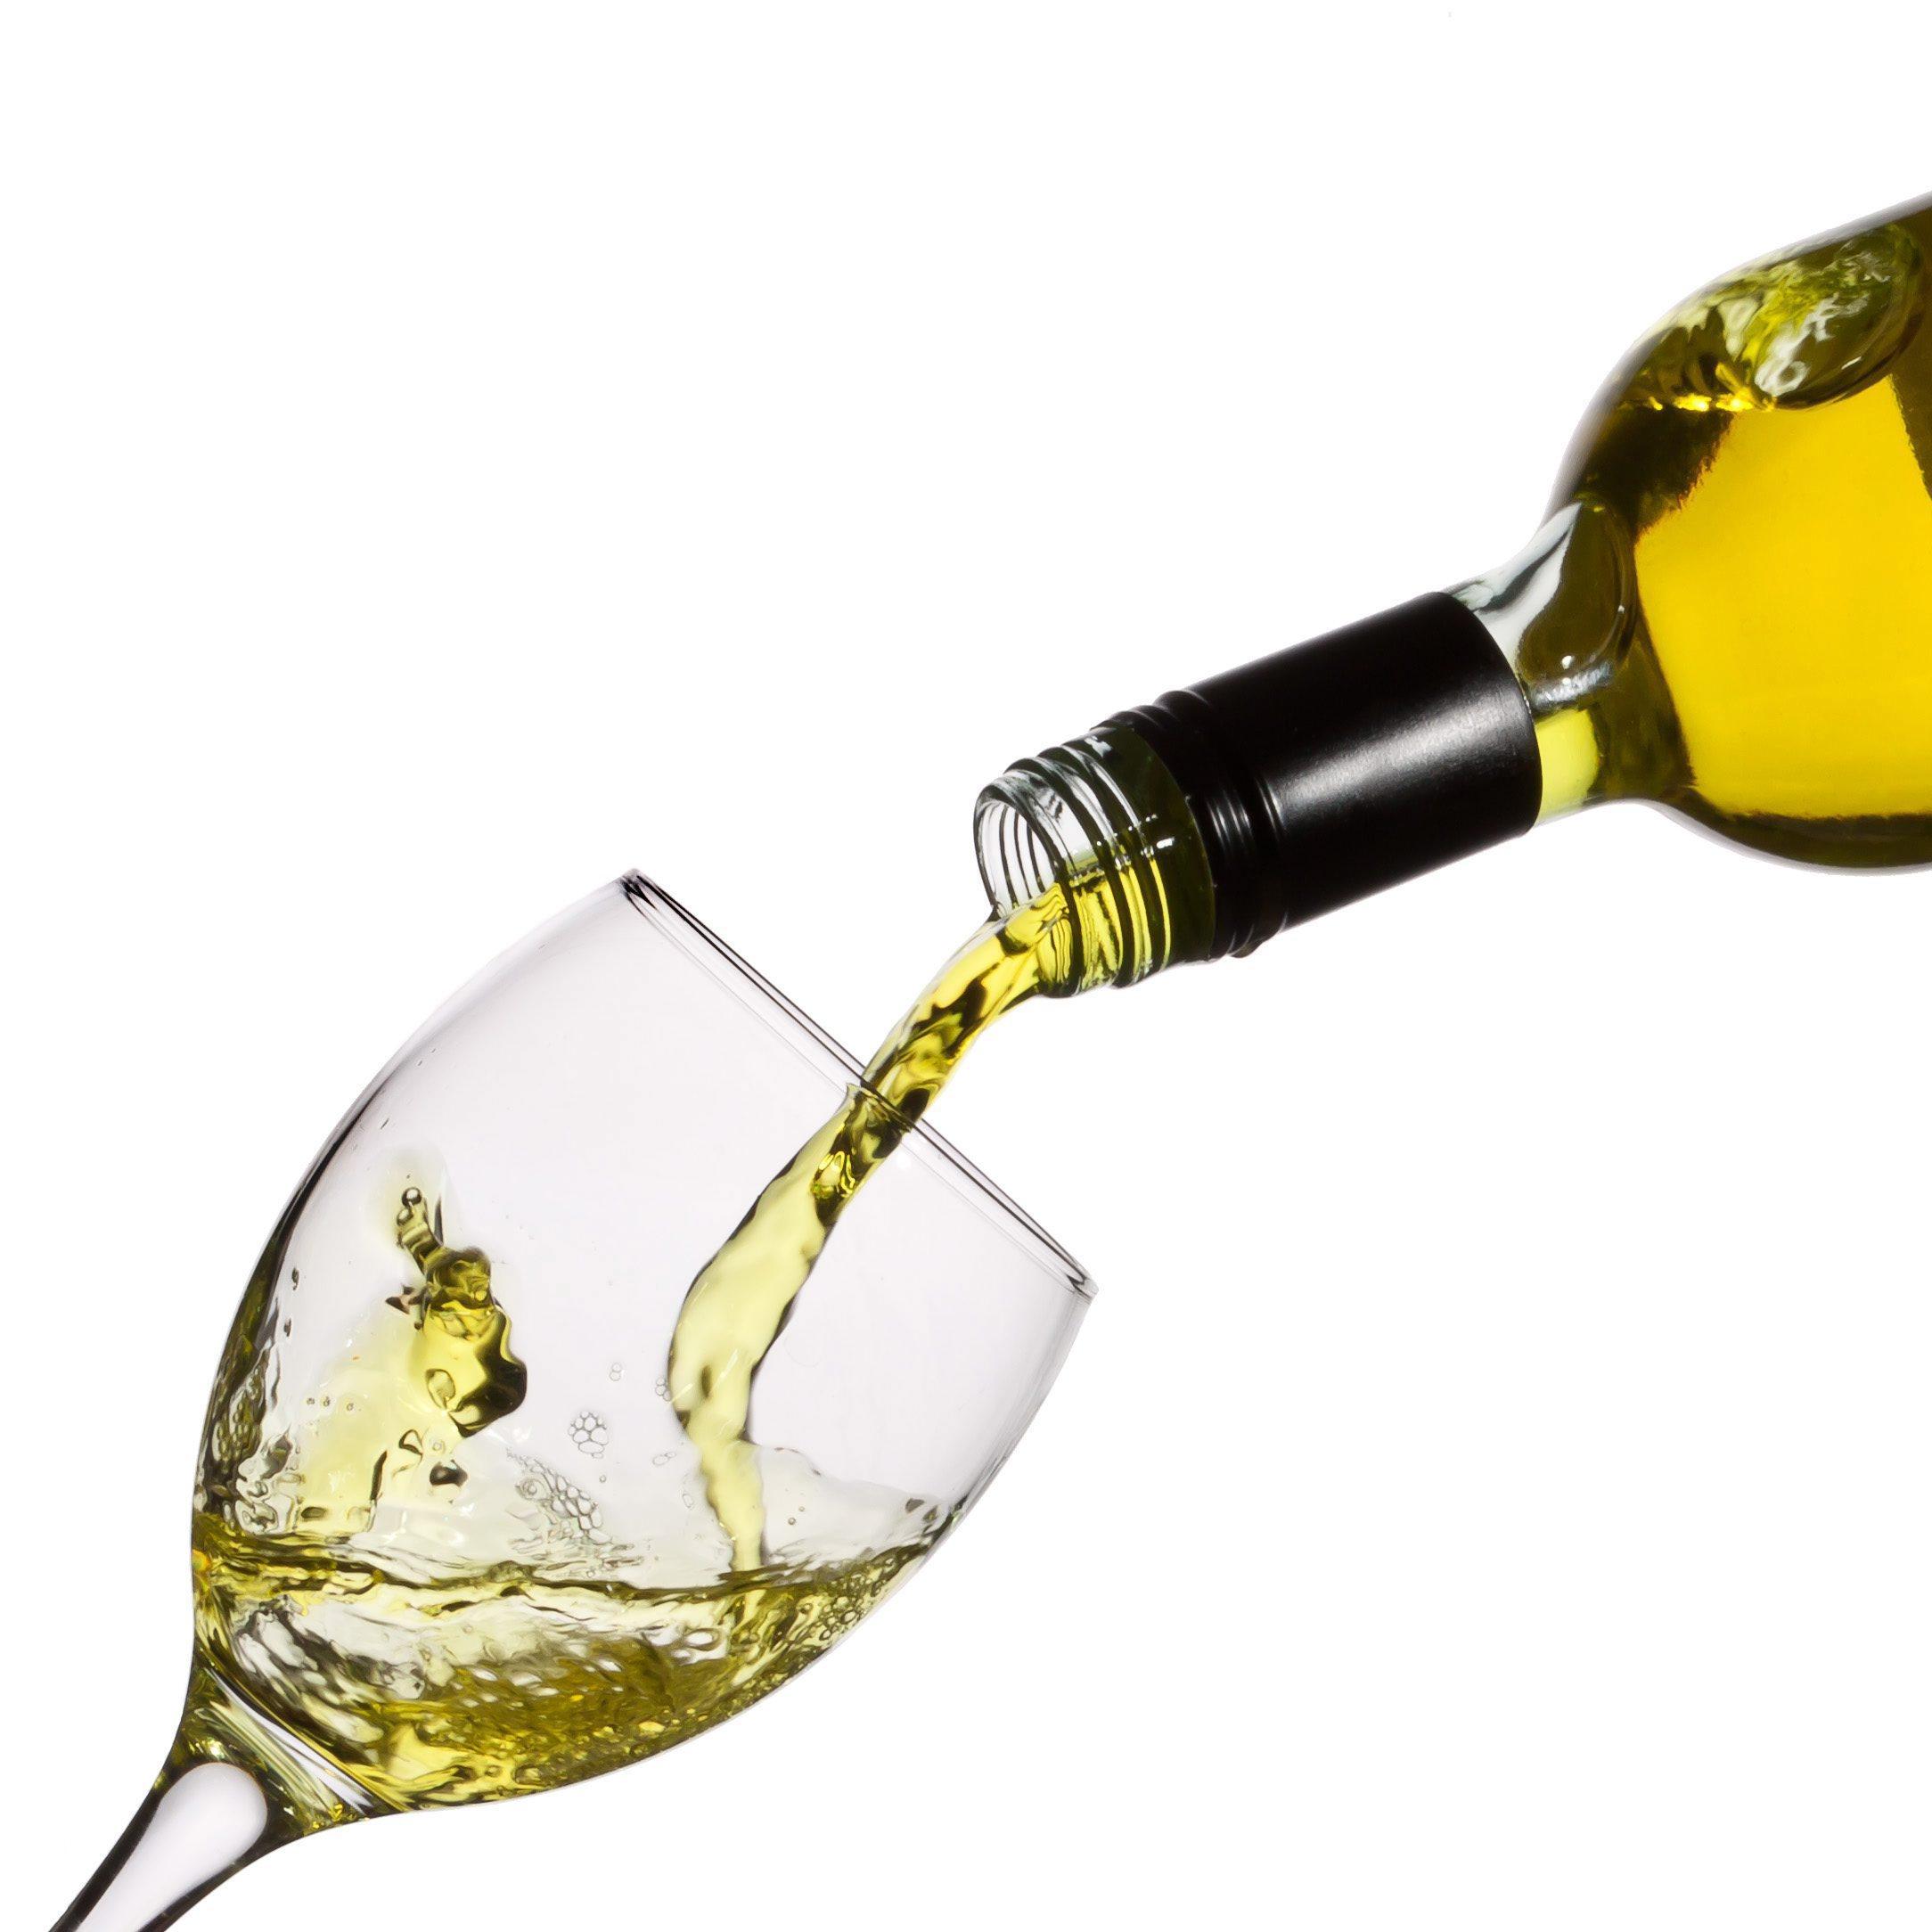 Rraise A Chilled Glass Of Chenin Blanc This Season photo